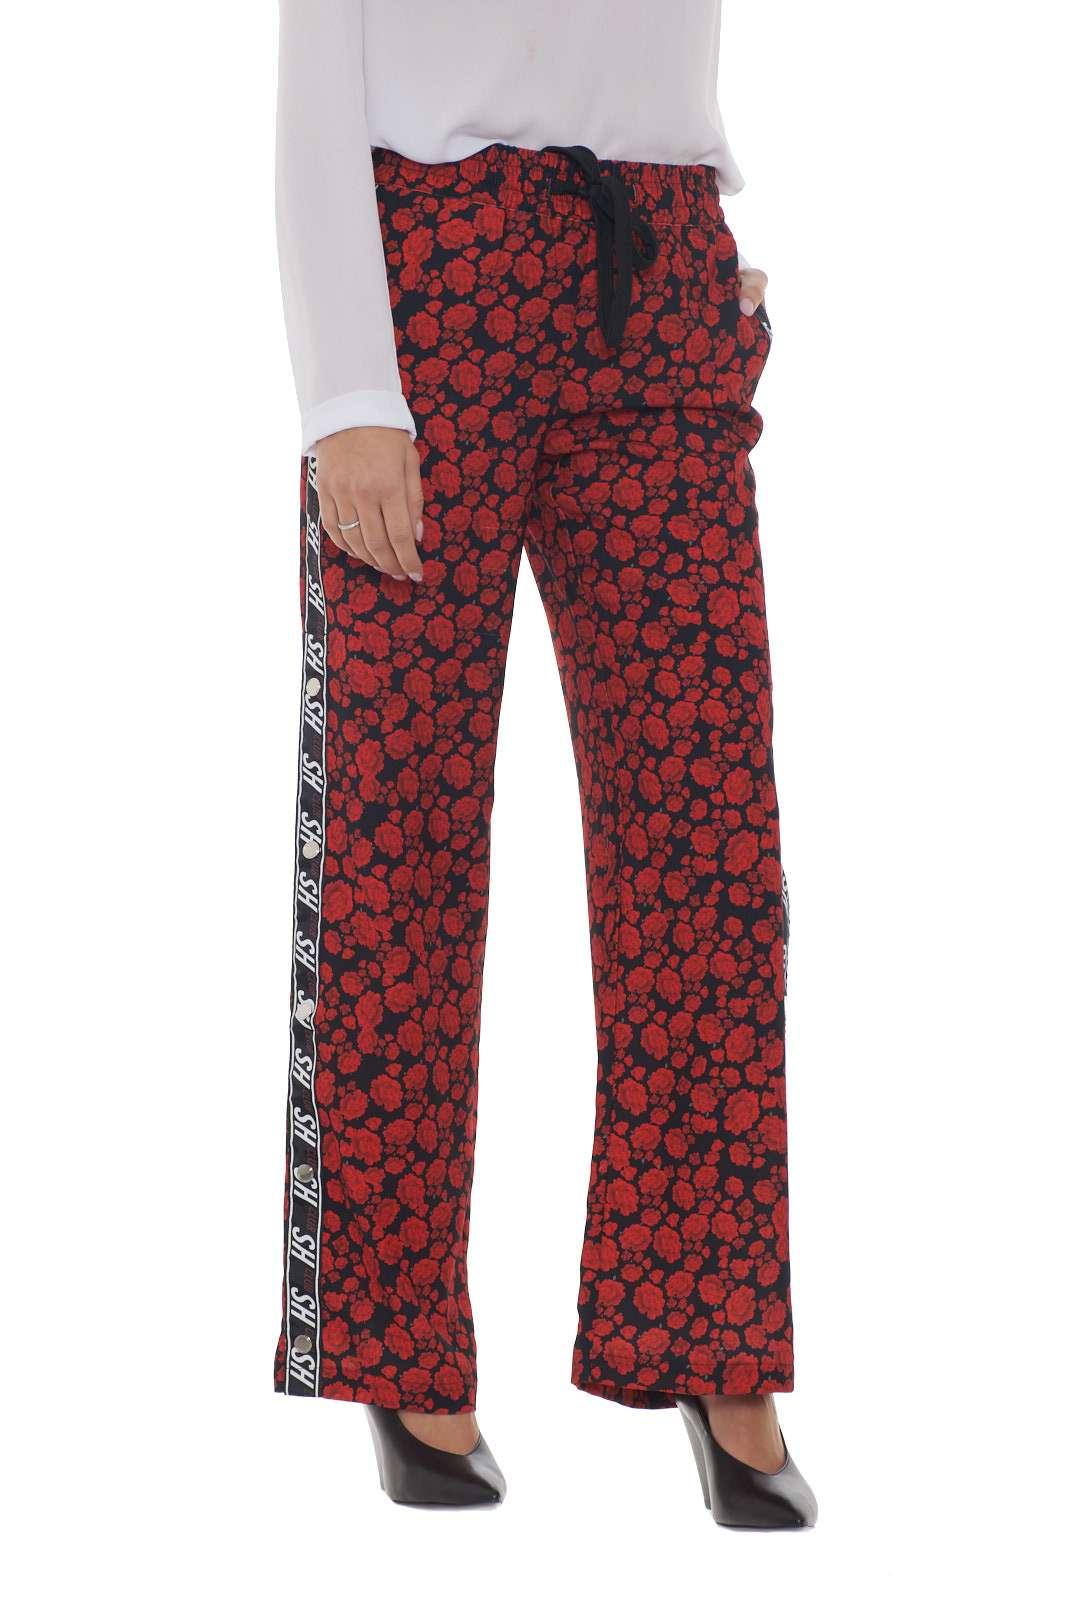 https://www.parmax.com/media/catalog/product/a/i/AI-outlet_parmax-pantaloni-donna-SH-Collection-17102019-A.jpg